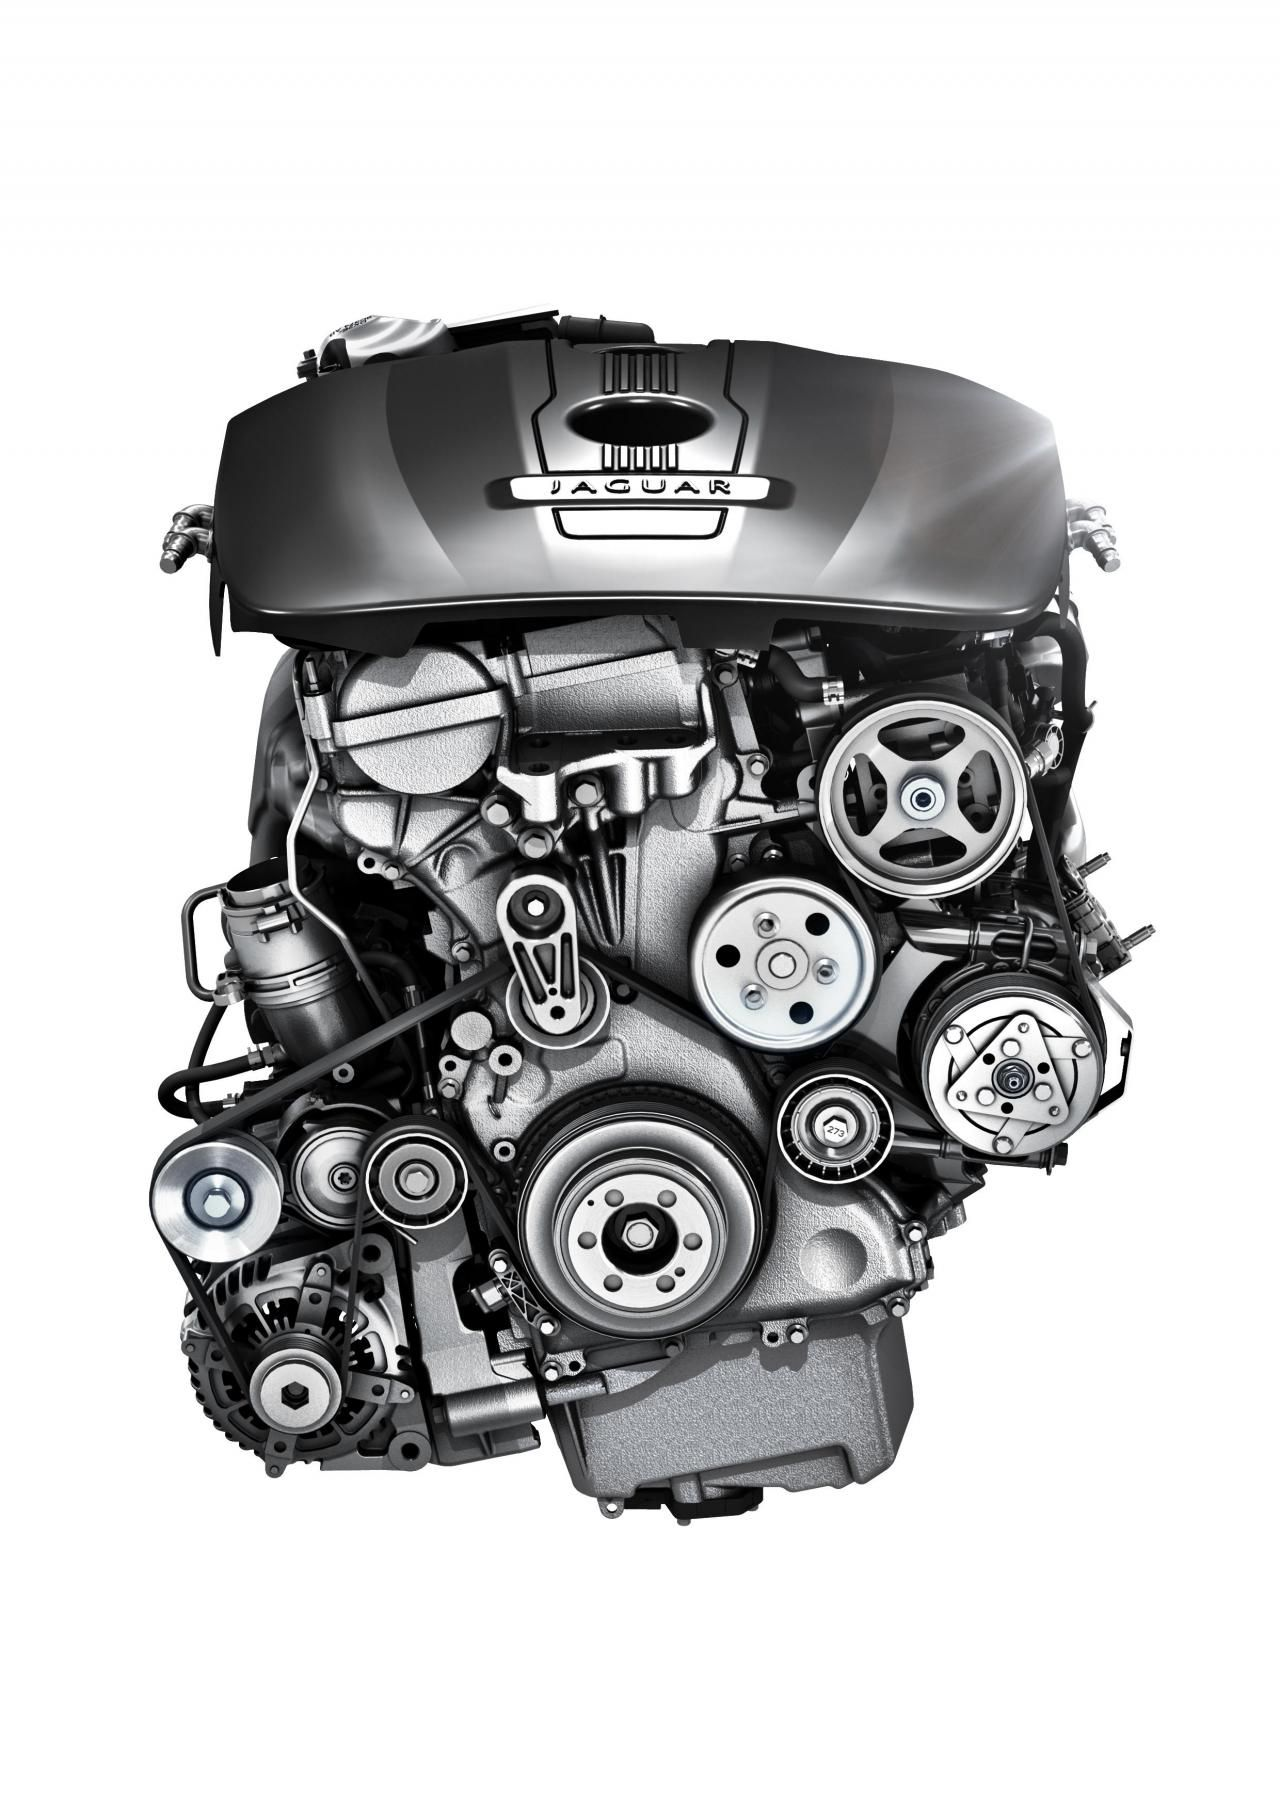 awd jaguar xe photos reviews r driver sport specs engines car and price